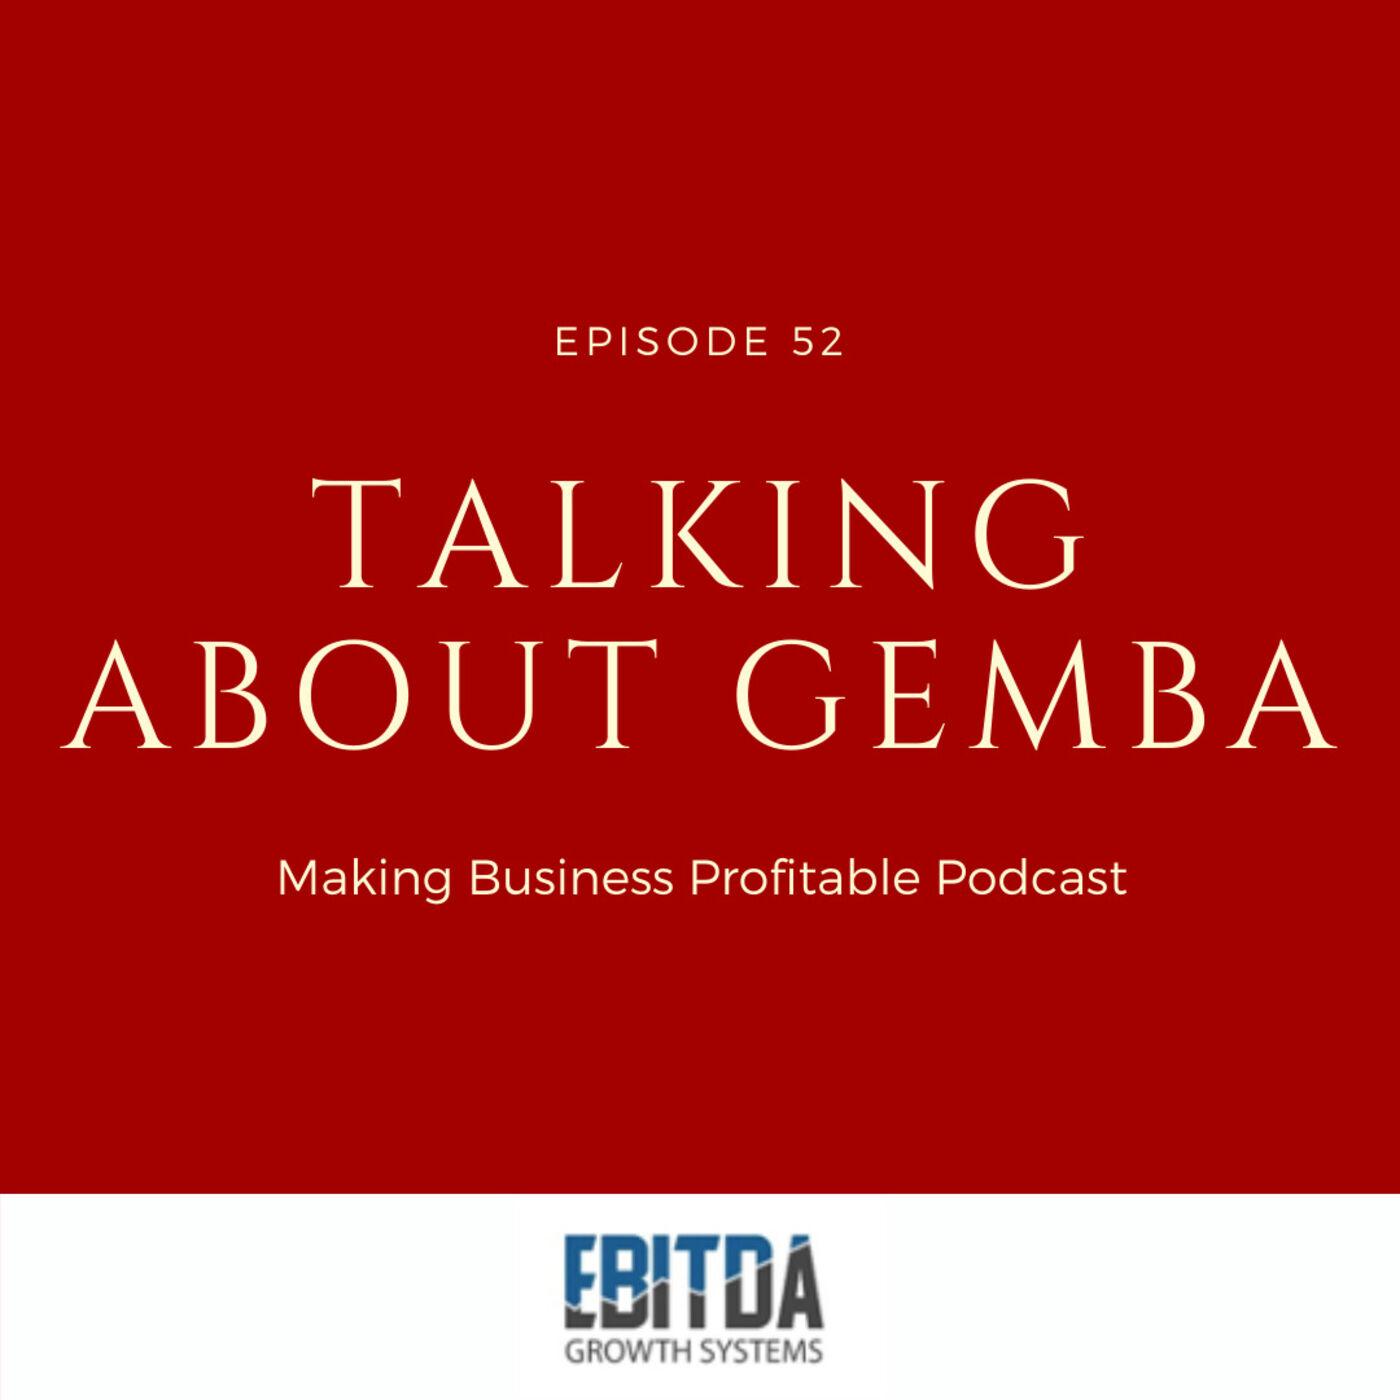 Episode 52 - Talking about GEMBA